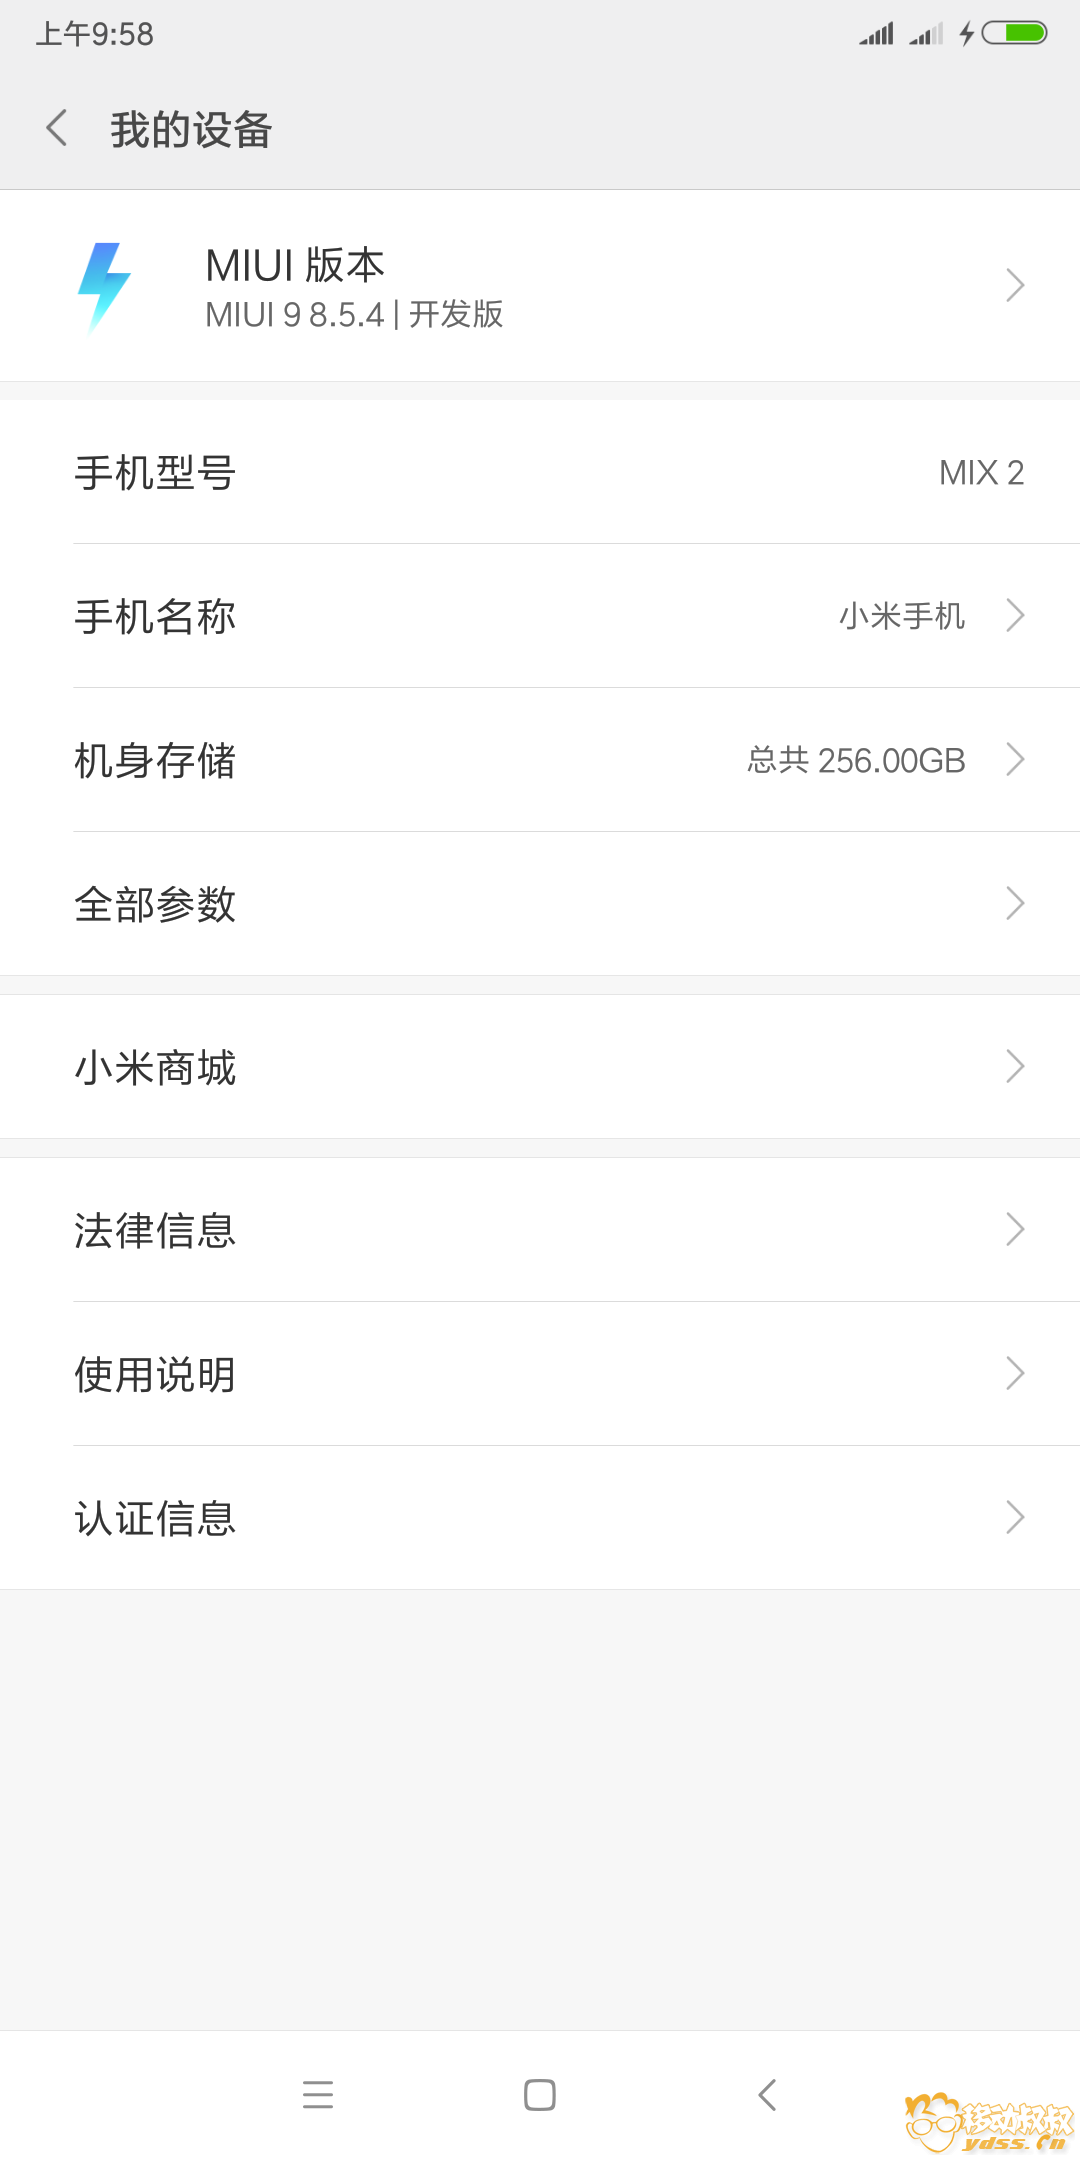 Screenshot_2018-05-05-09-58-07-116_com.android.settings.png